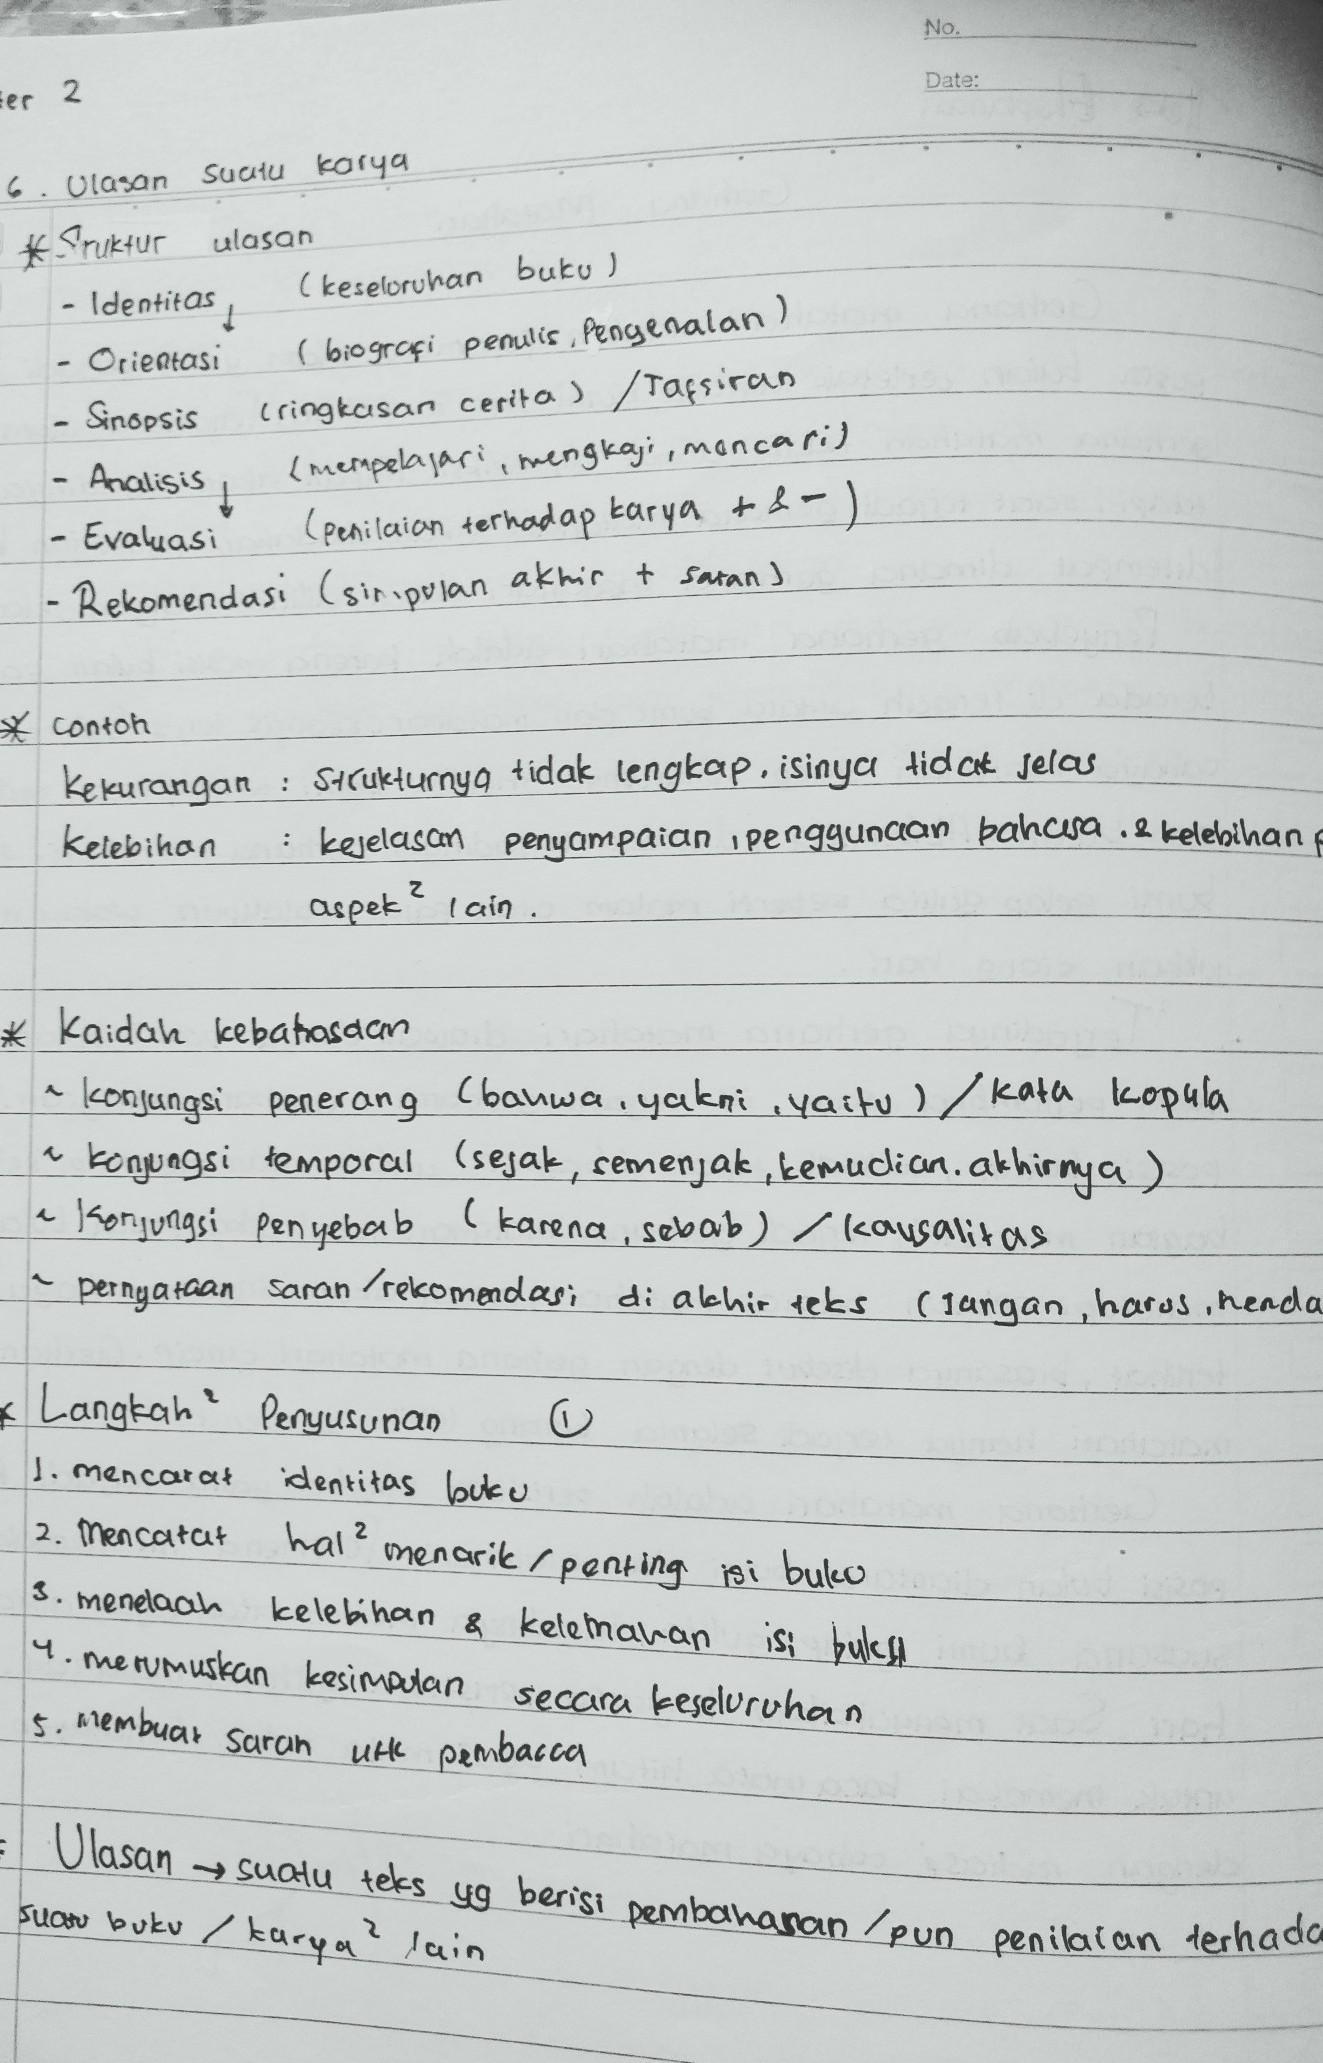 17 Contoh Makalah Bahasa Indonesia Tentang Rangkuman